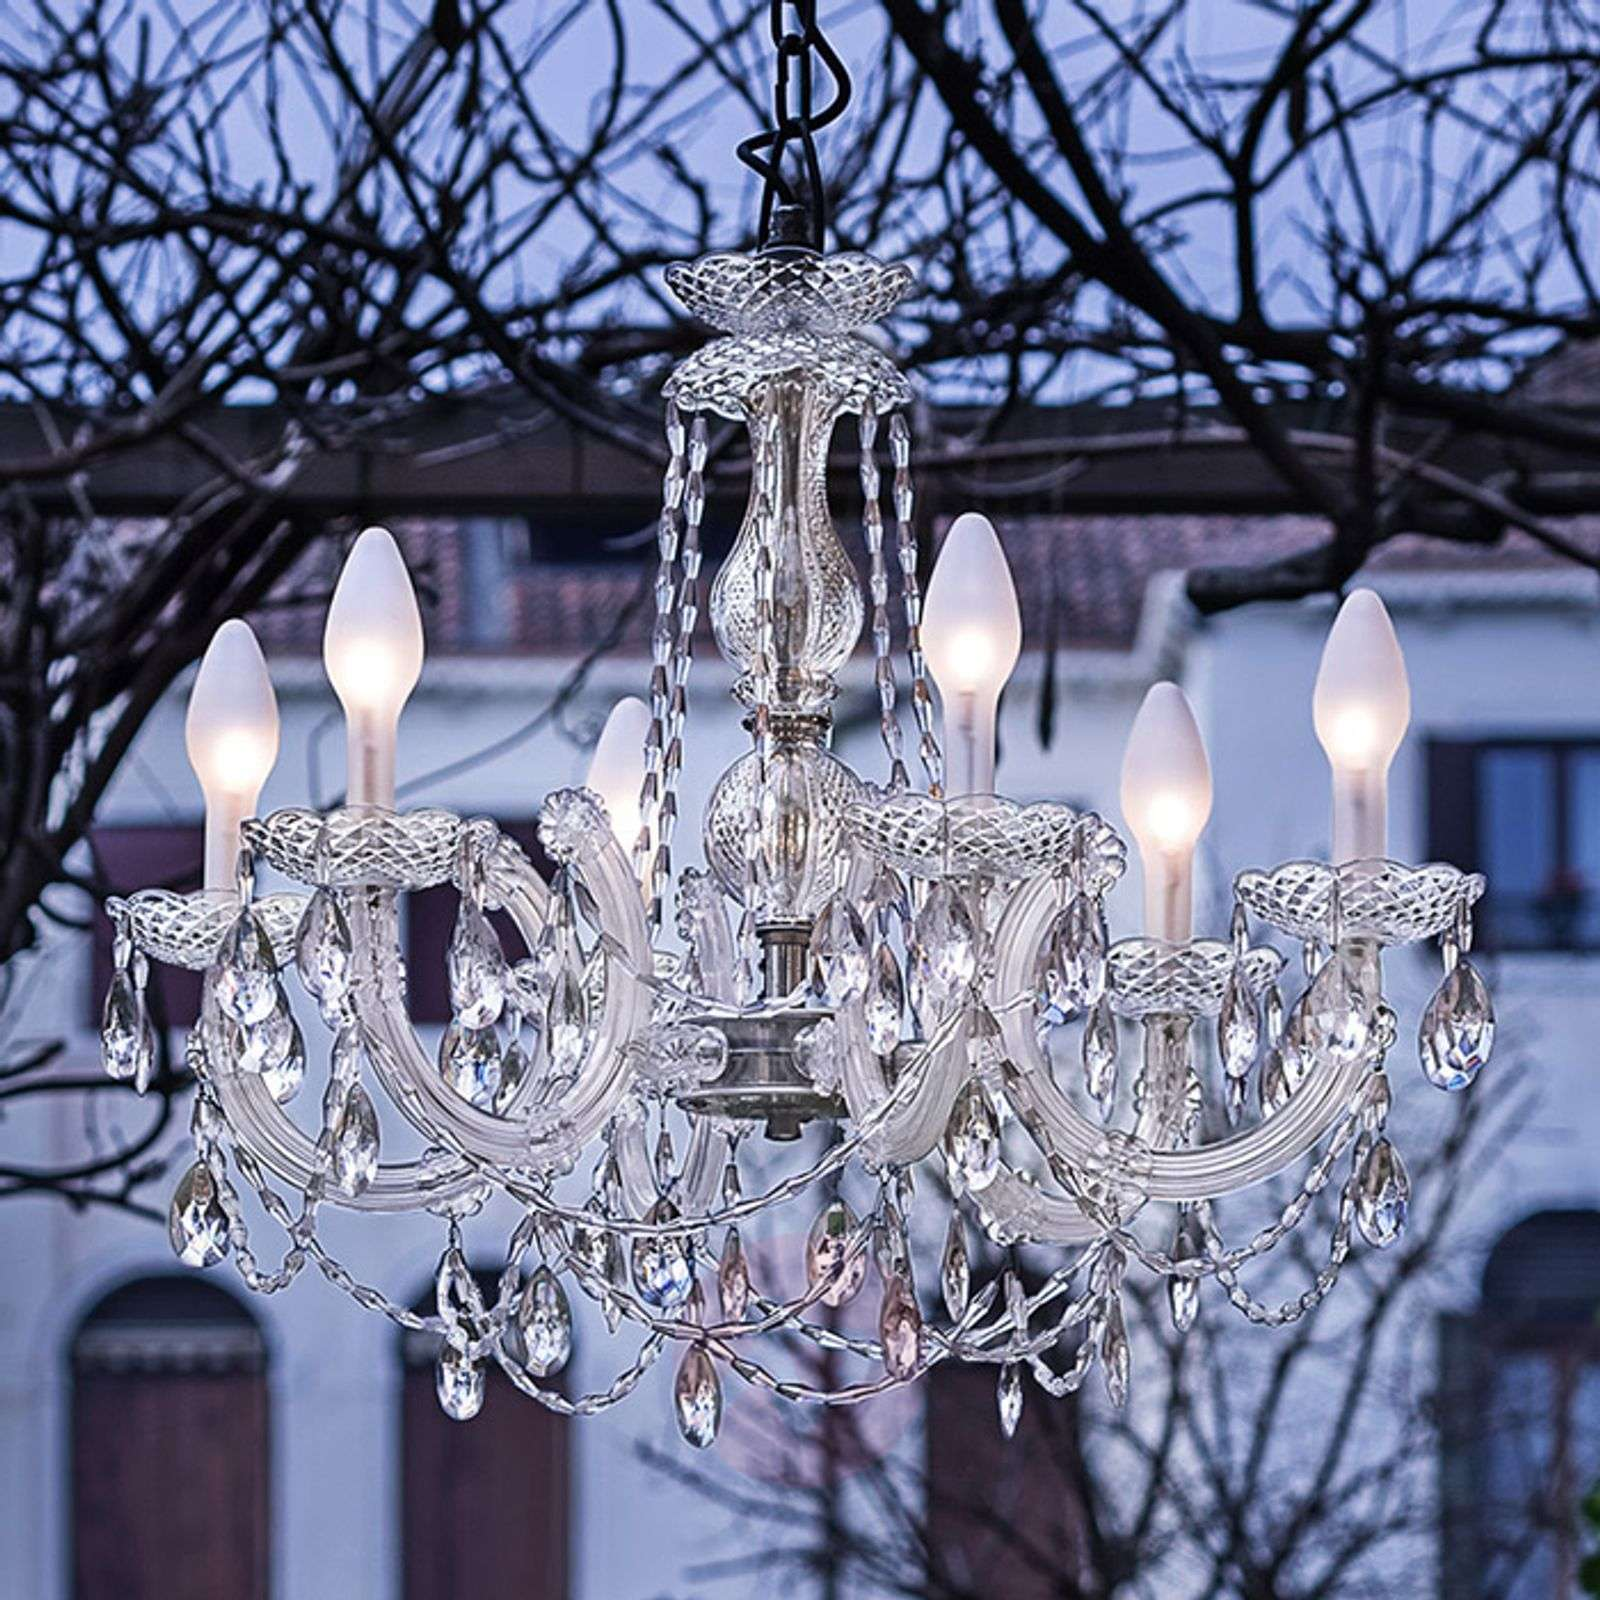 Drylight s6 6 bulb outdoor led chandelier lights aloadofball Gallery